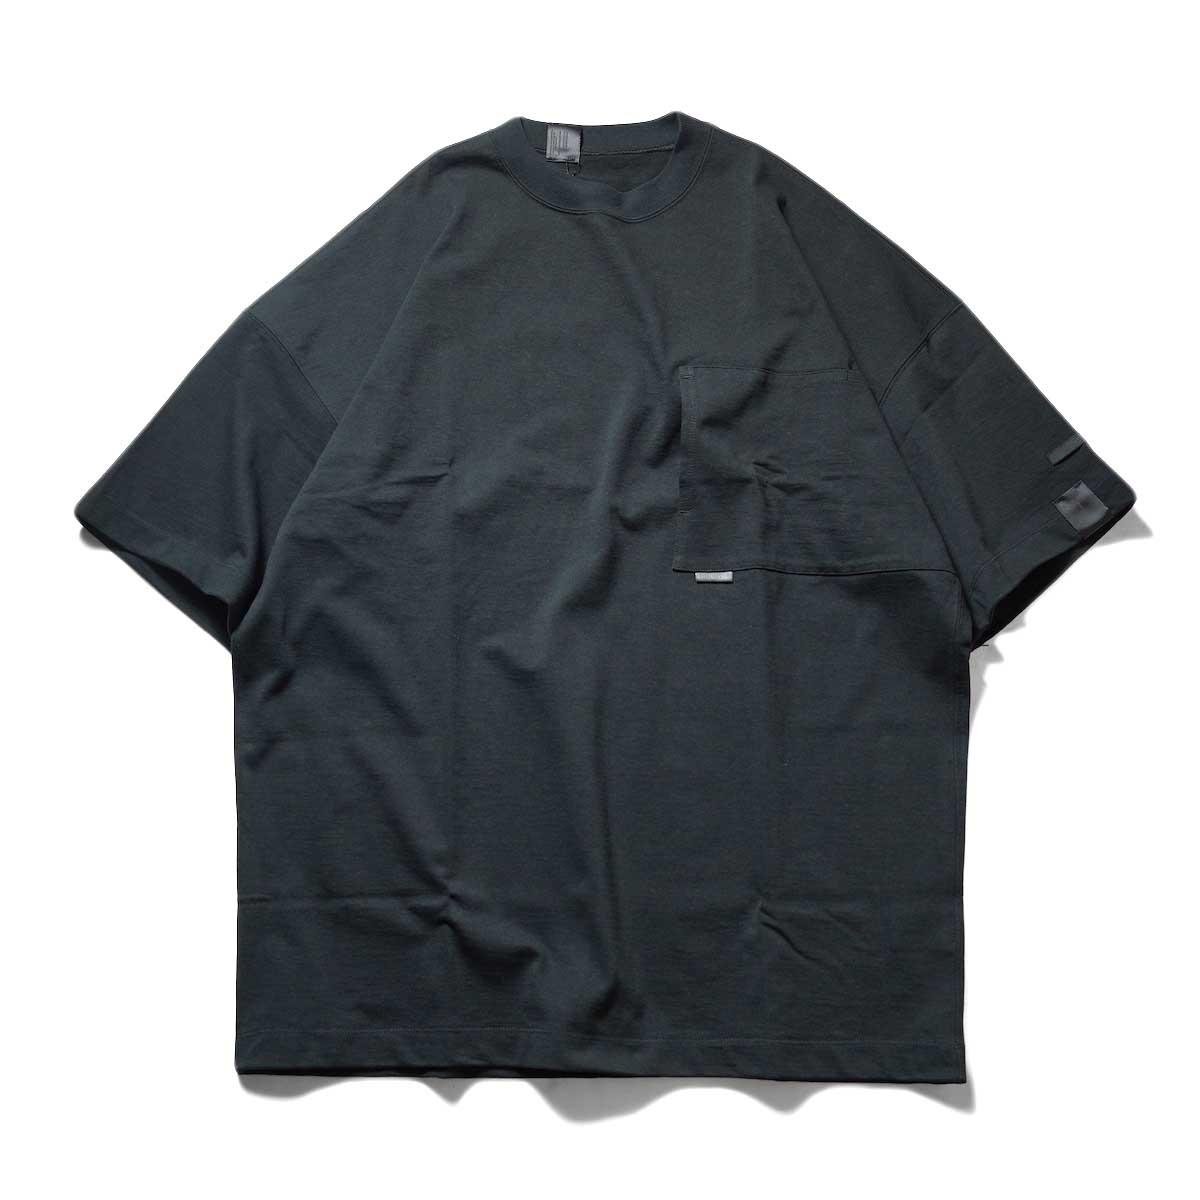 N.HOOLYWOOD / 2212-CS07-018 BIG T-Shirt (Black)